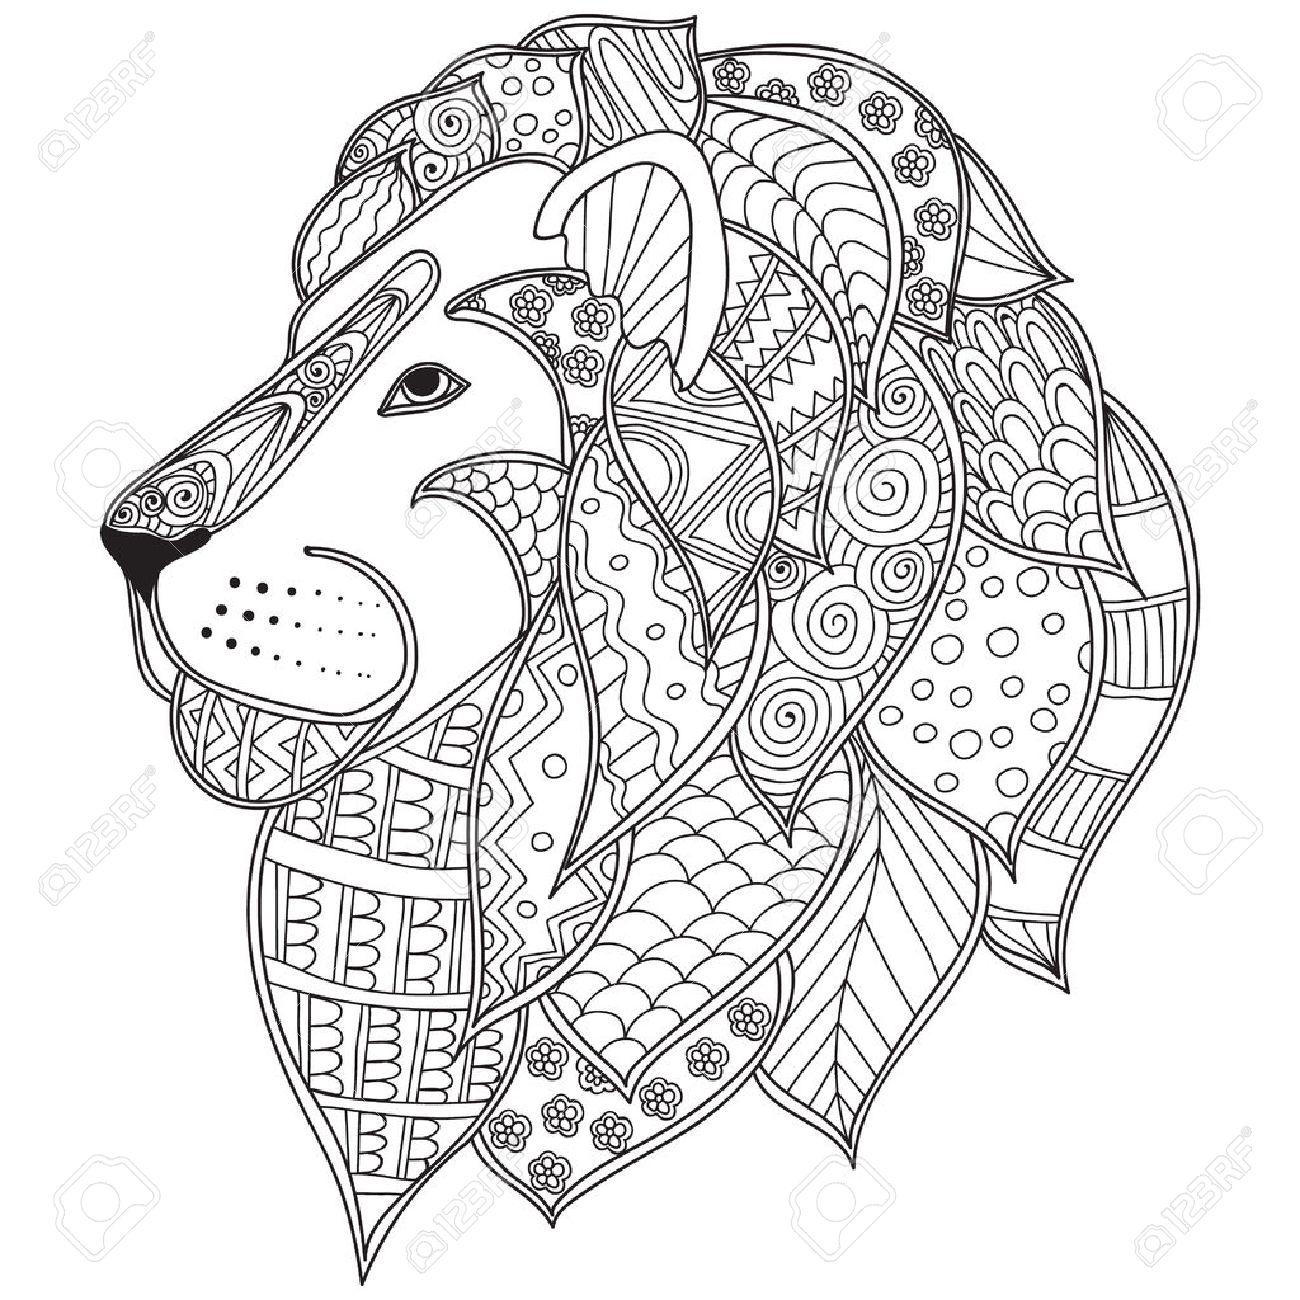 Lioness face outline